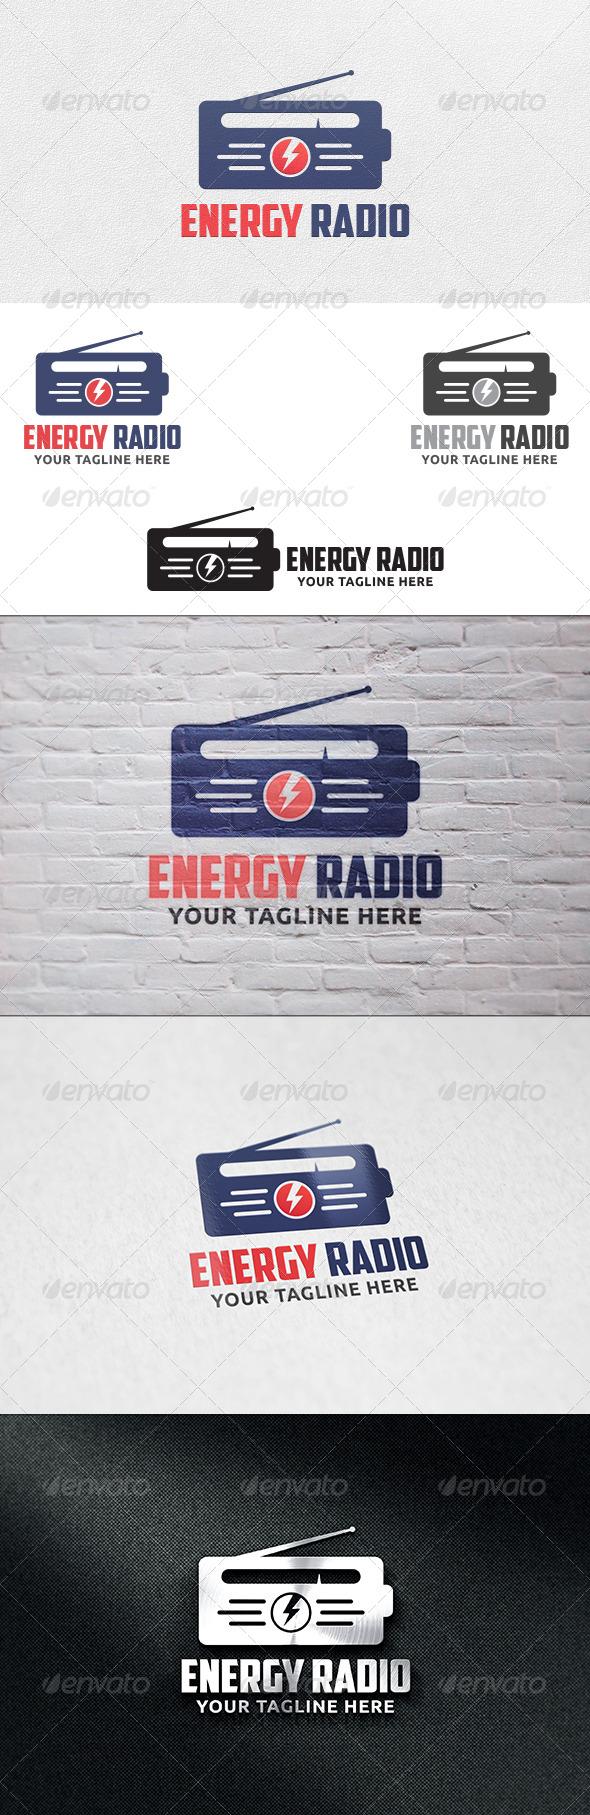 GraphicRiver Energy Radio Logo Template 6435459